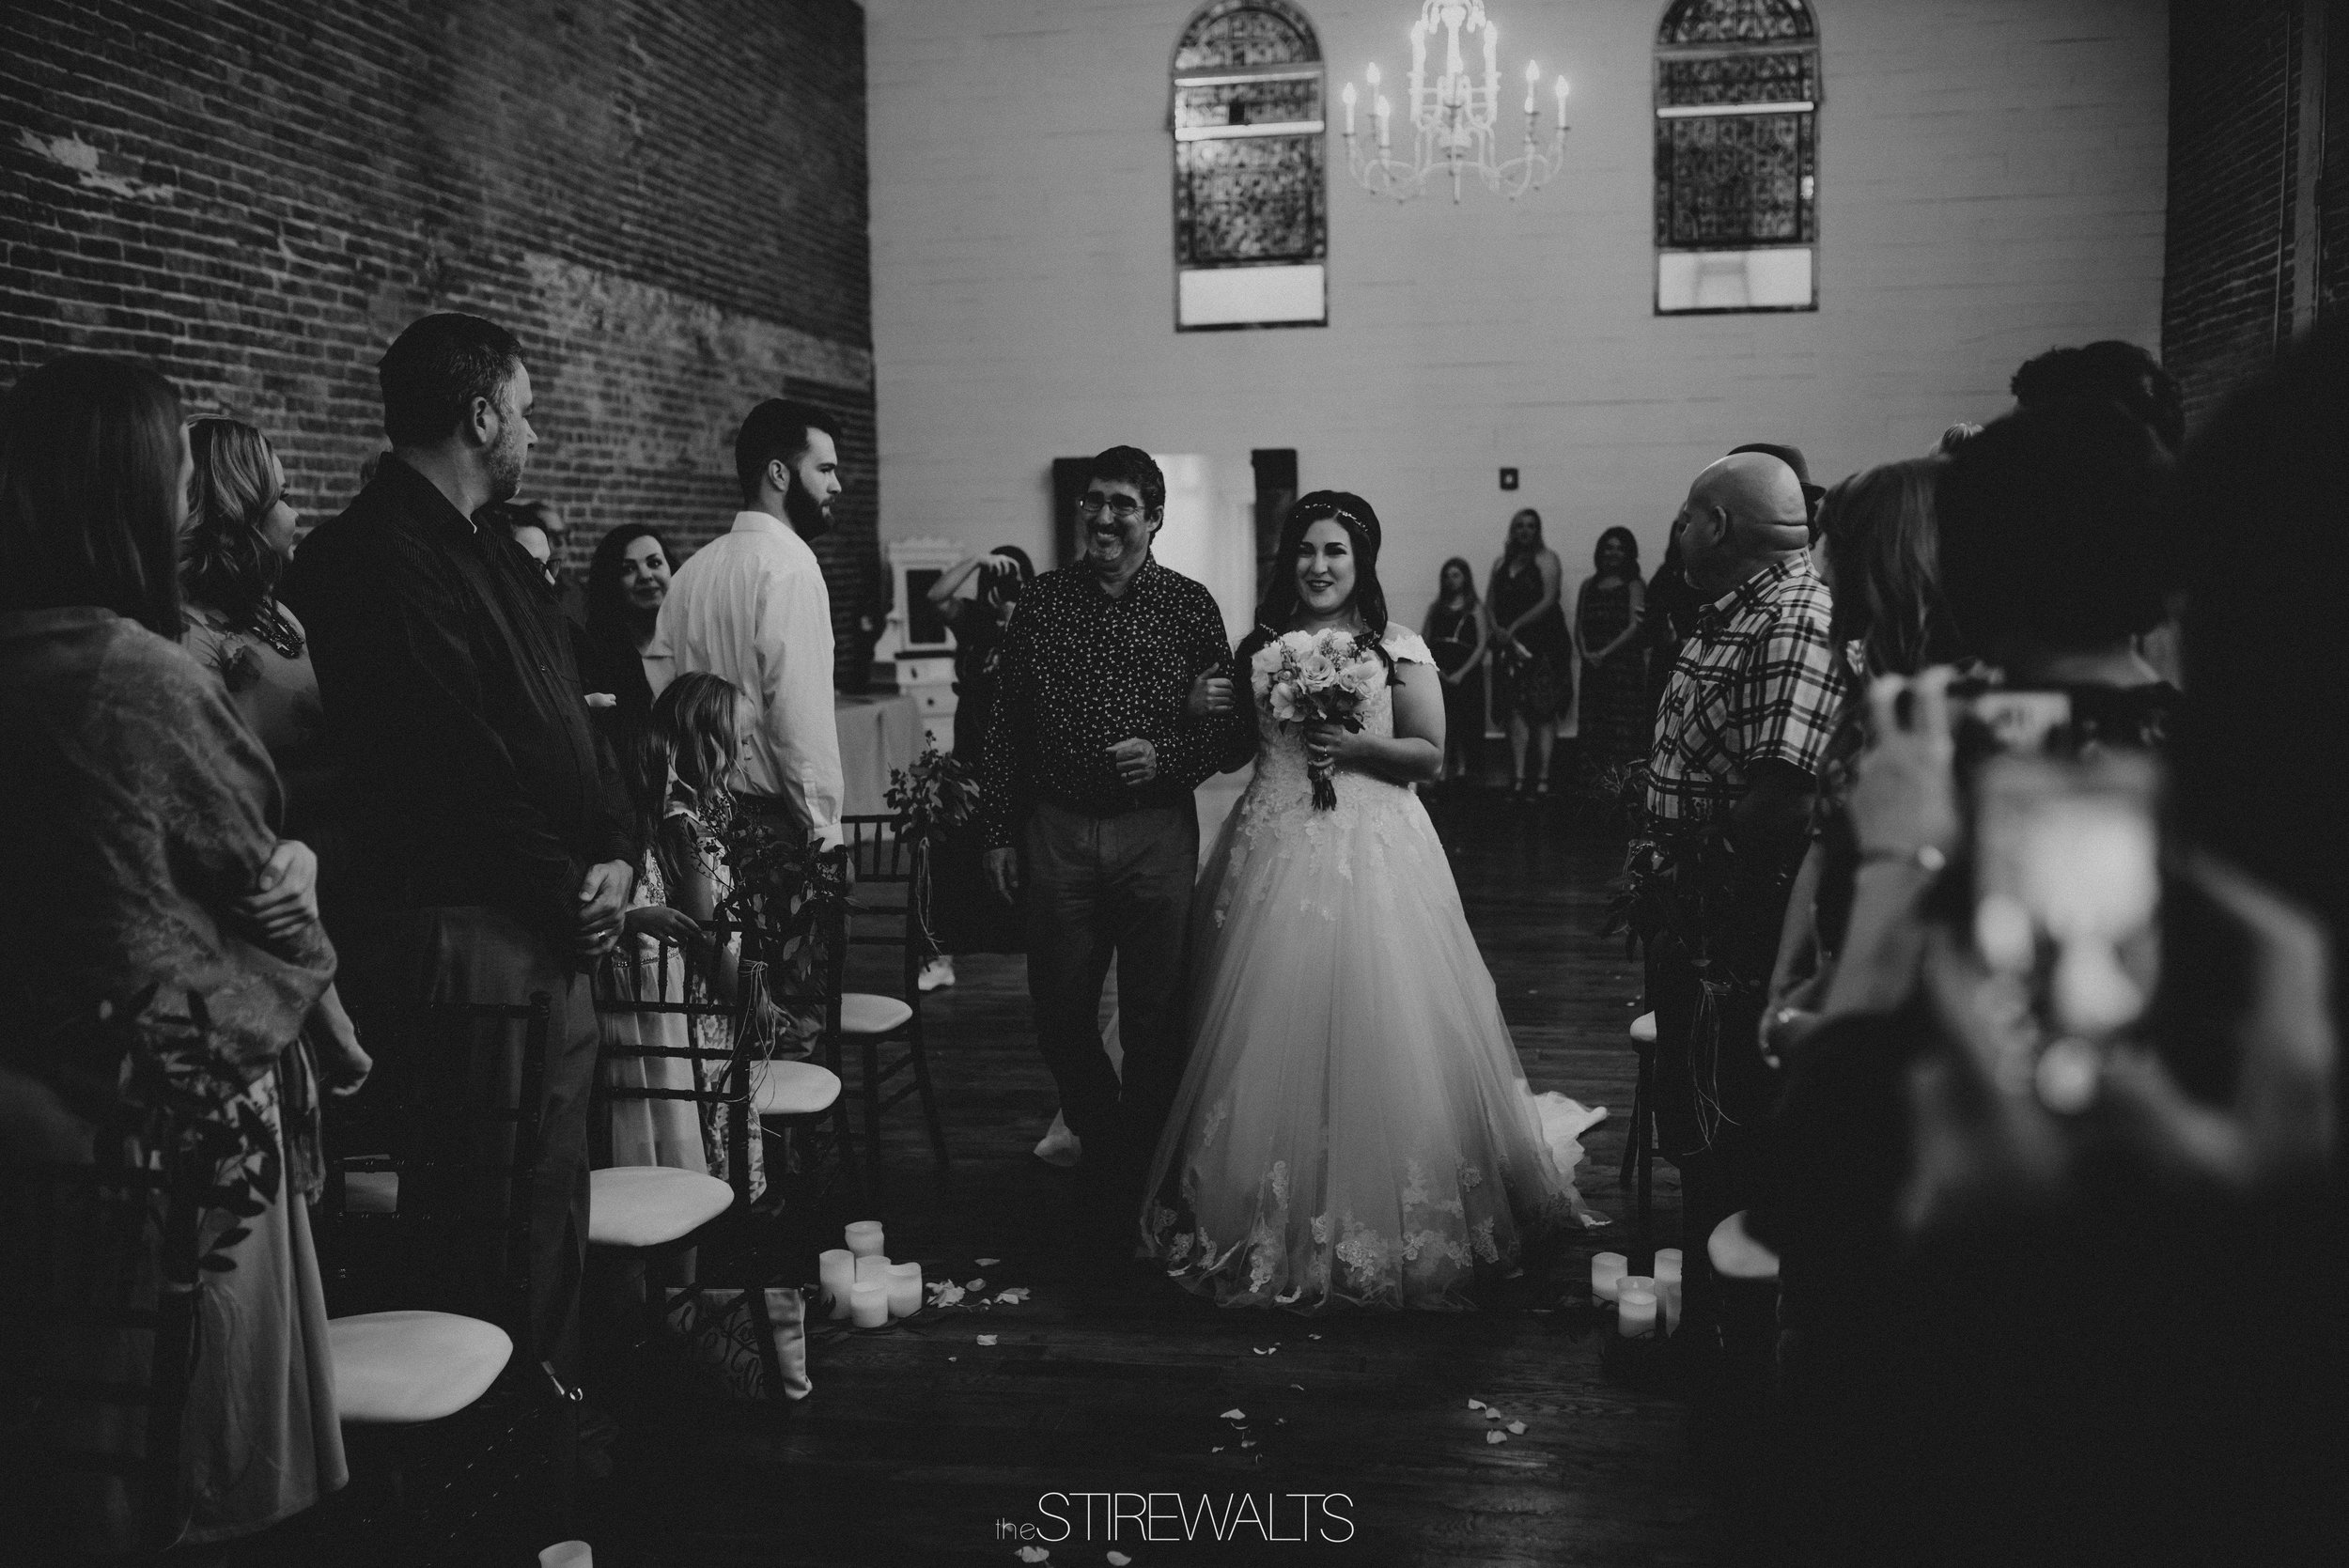 Sara.Jon.Wedding.Blog.2018.©TheStirewalts-58.jpg